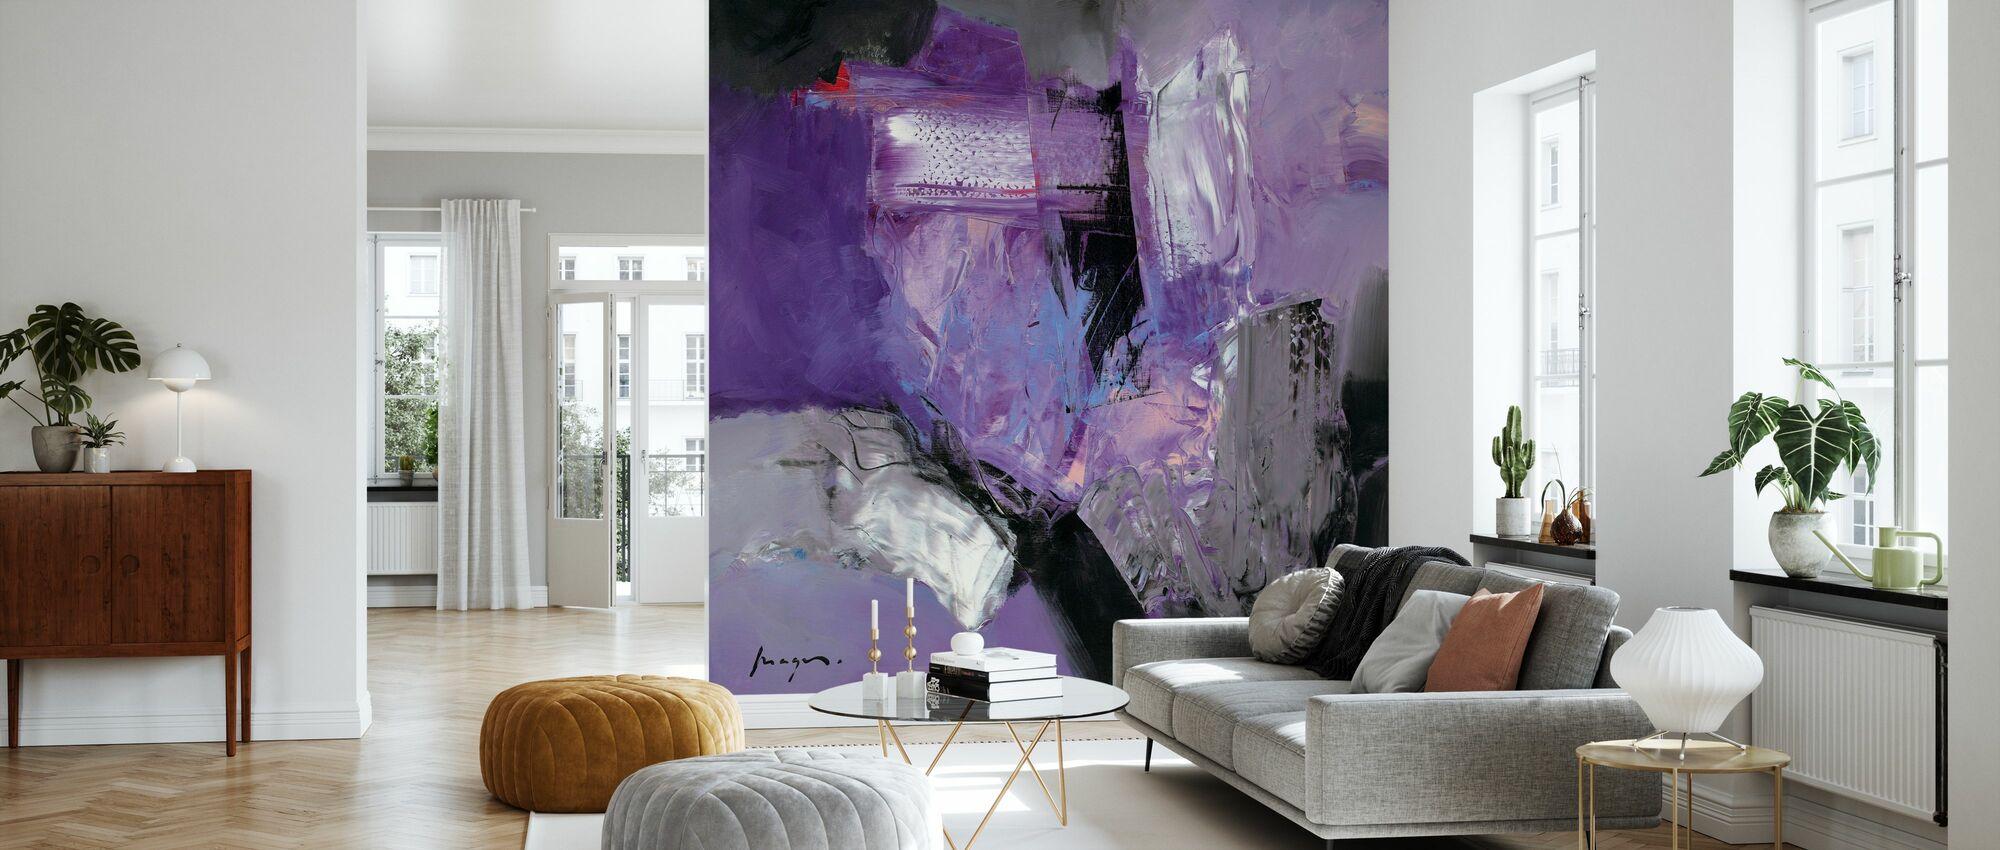 Abstract Variations - Wallpaper - Living Room